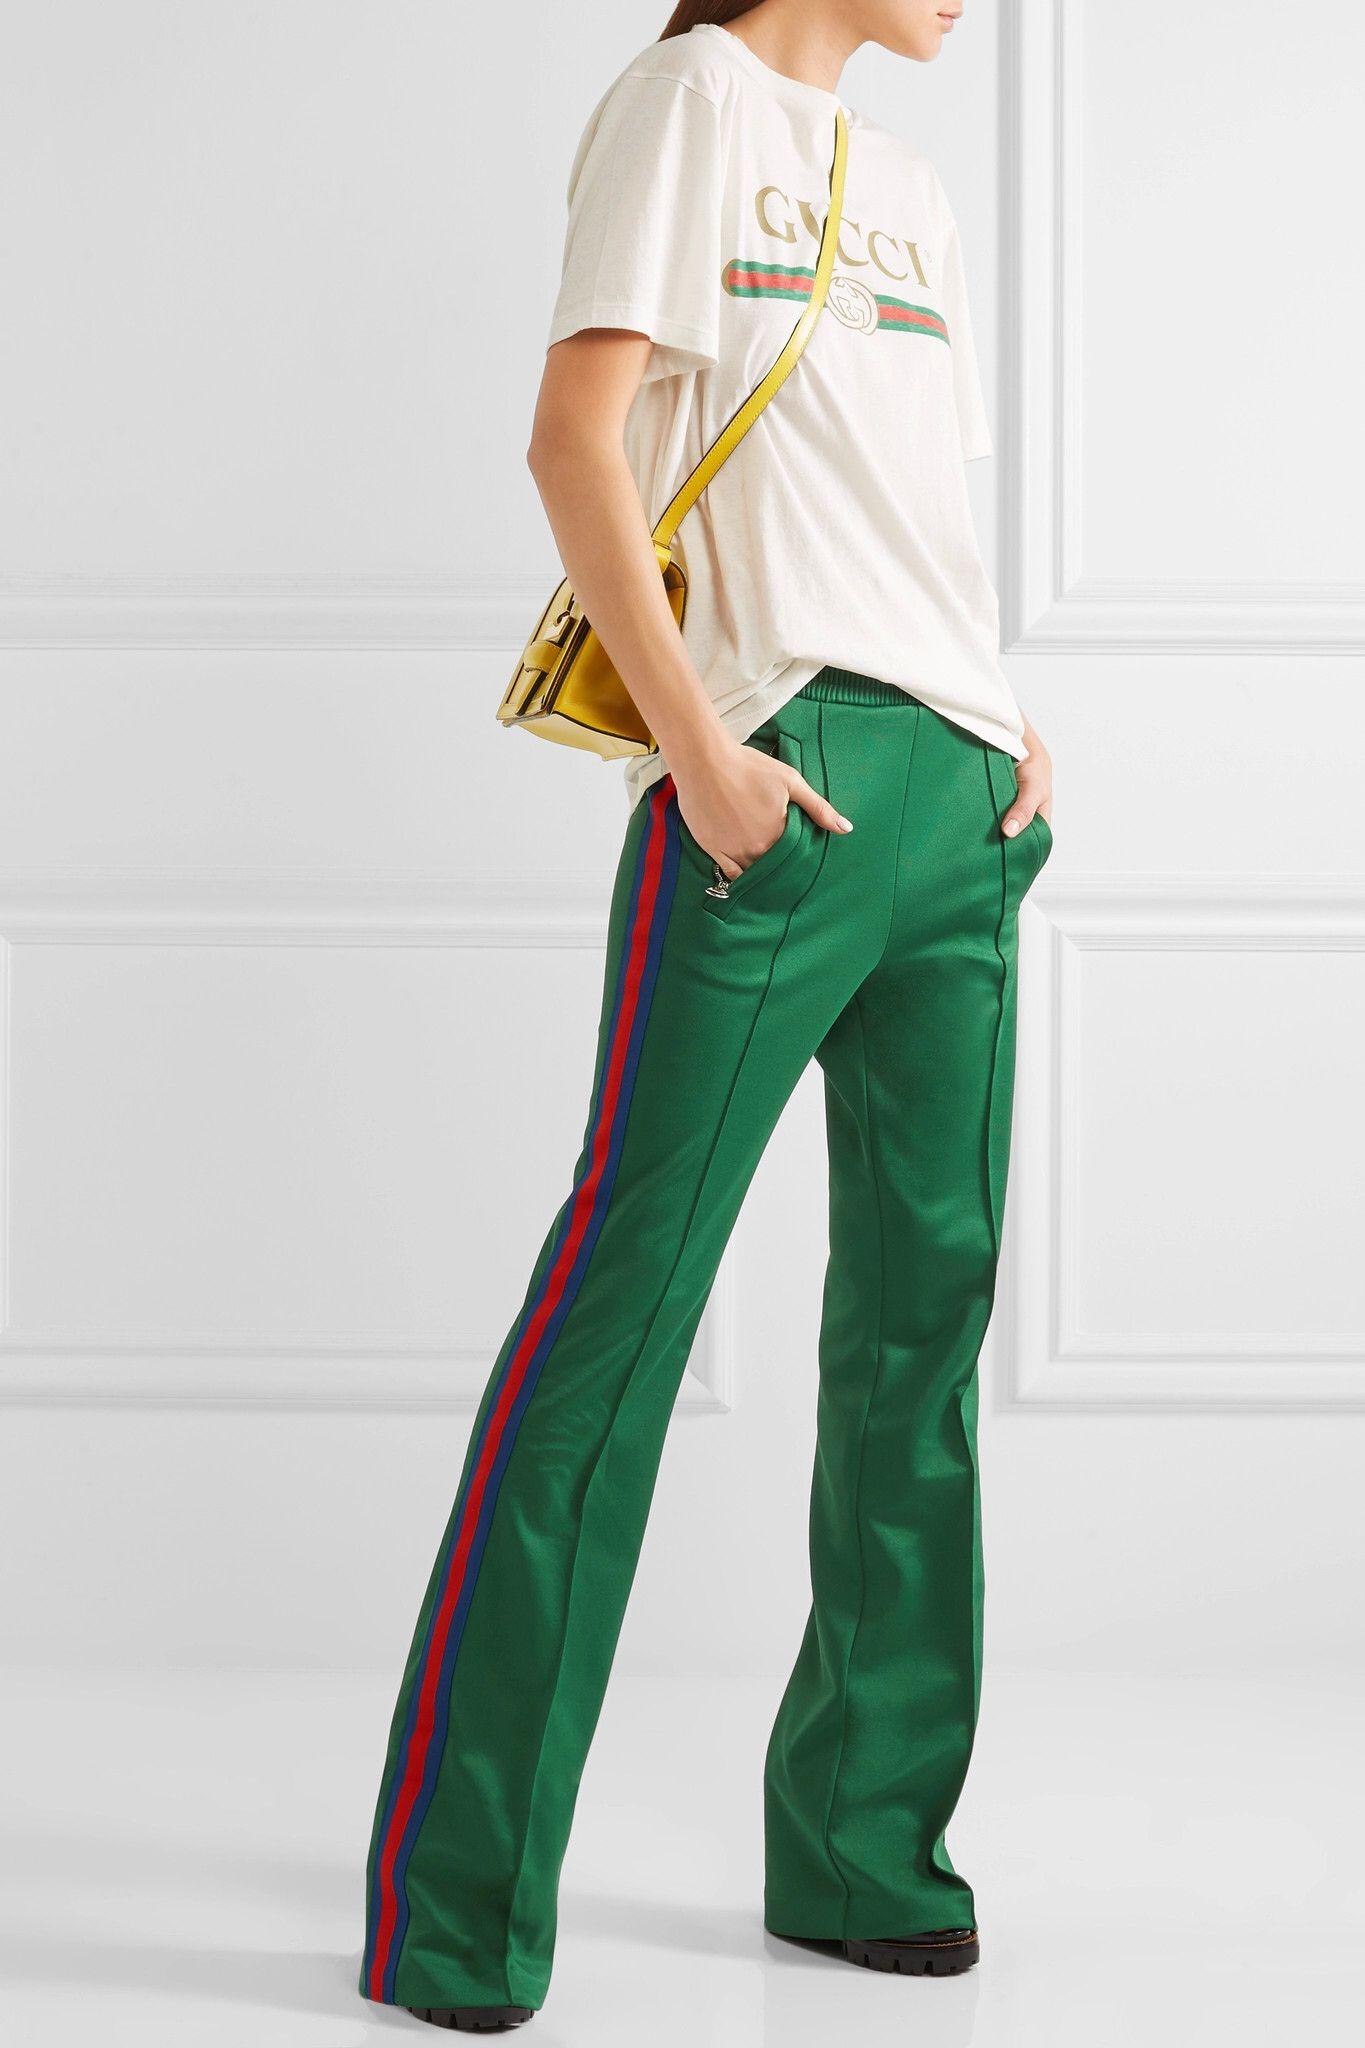 8517d37901f1 Shown here with  Gucci Pants, Gucci T-shirt, Loewe Shoulder bag, Prada  Sandals, Isabel Marant Earrings, Charlotte Chesnais Rings.